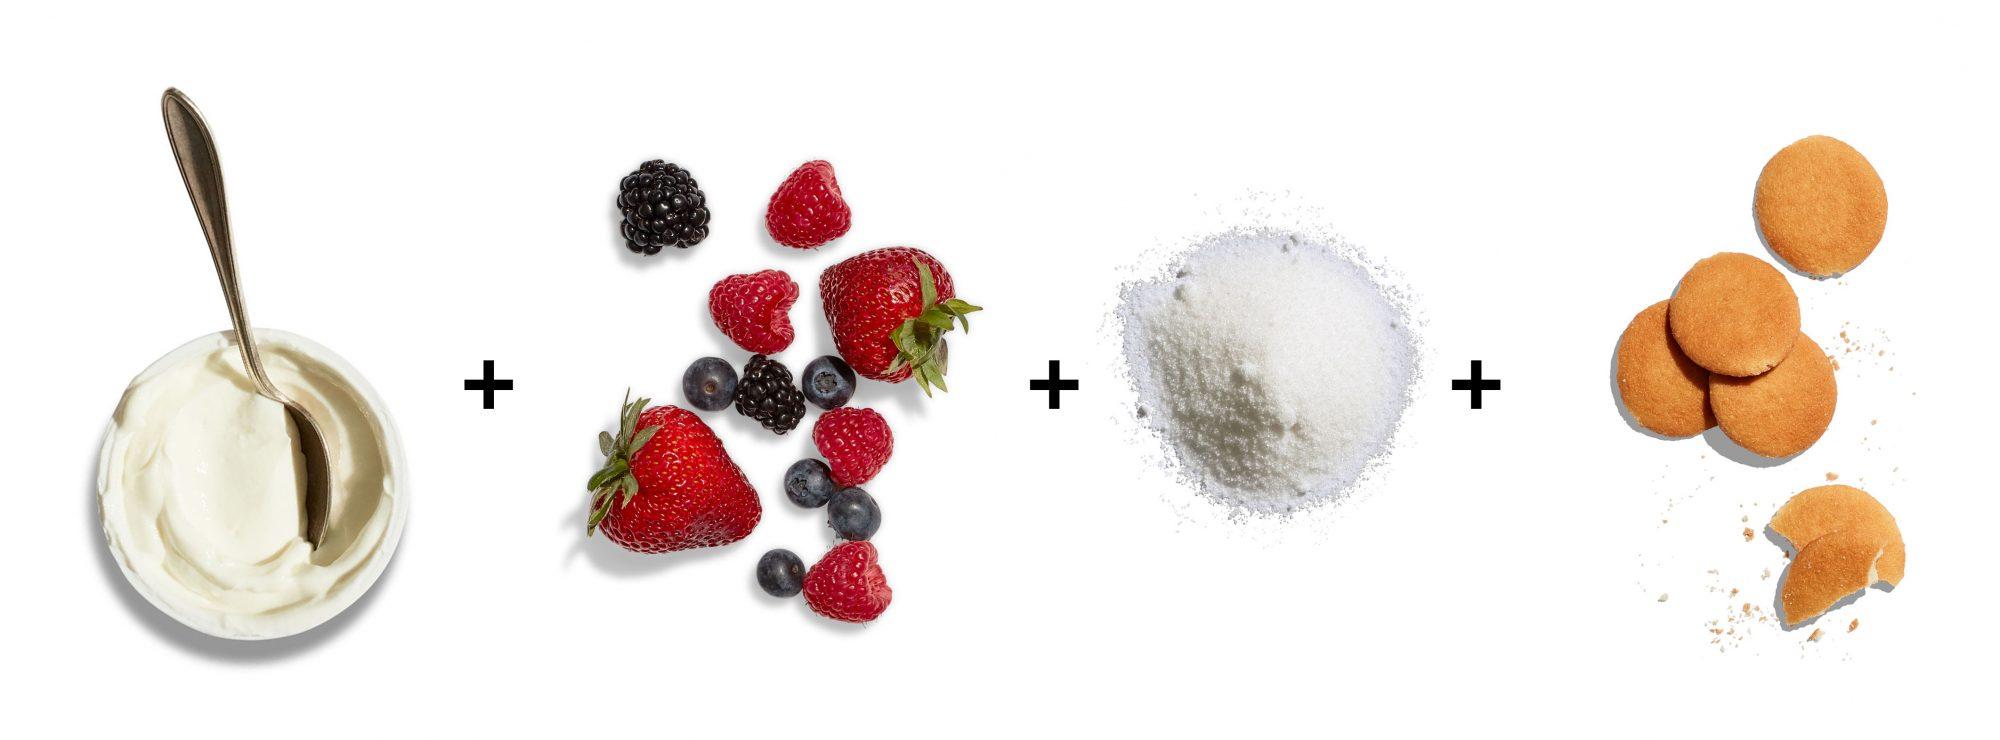 berry easy dessert ingredients formula